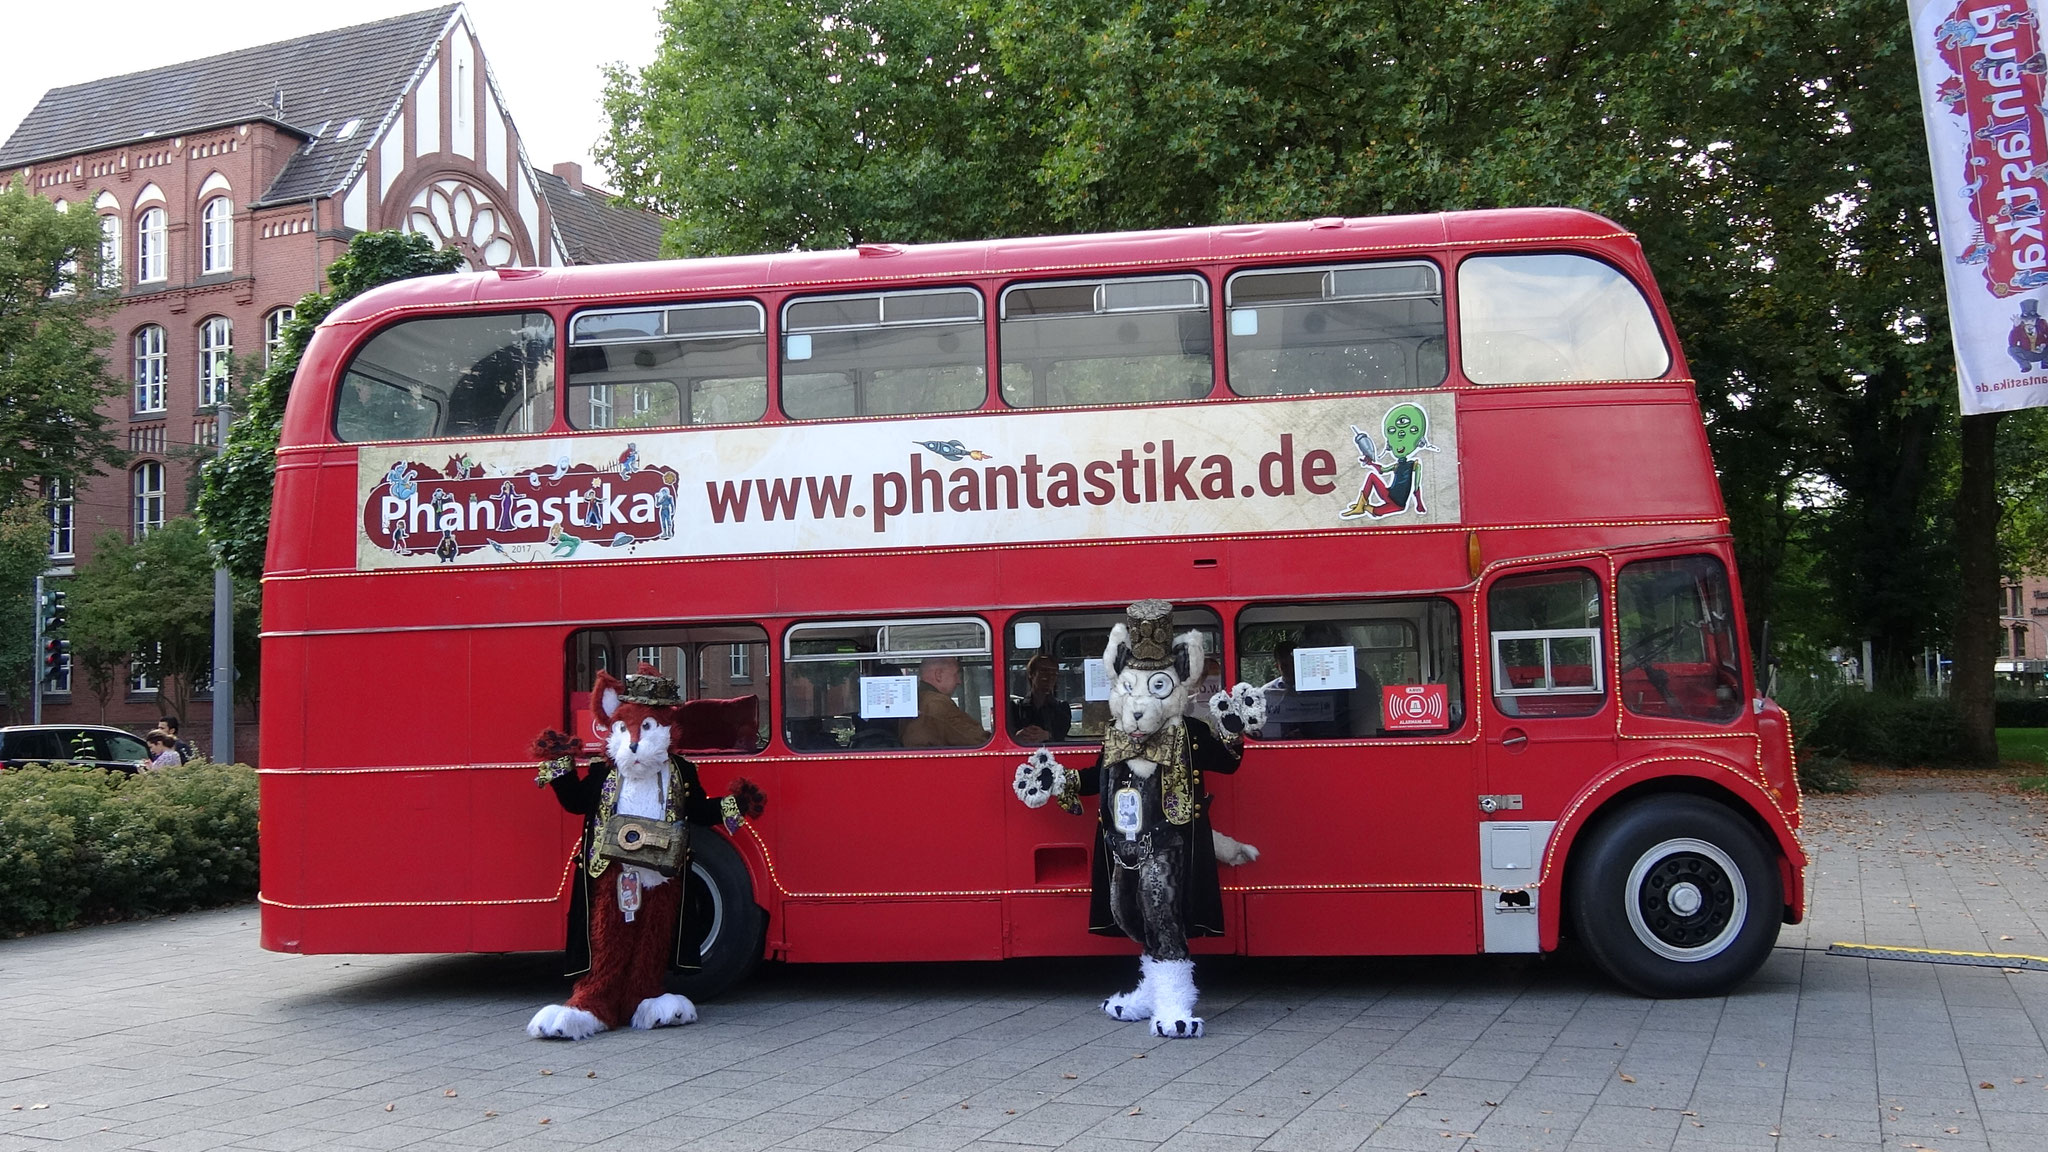 Phantastika Oberhausen